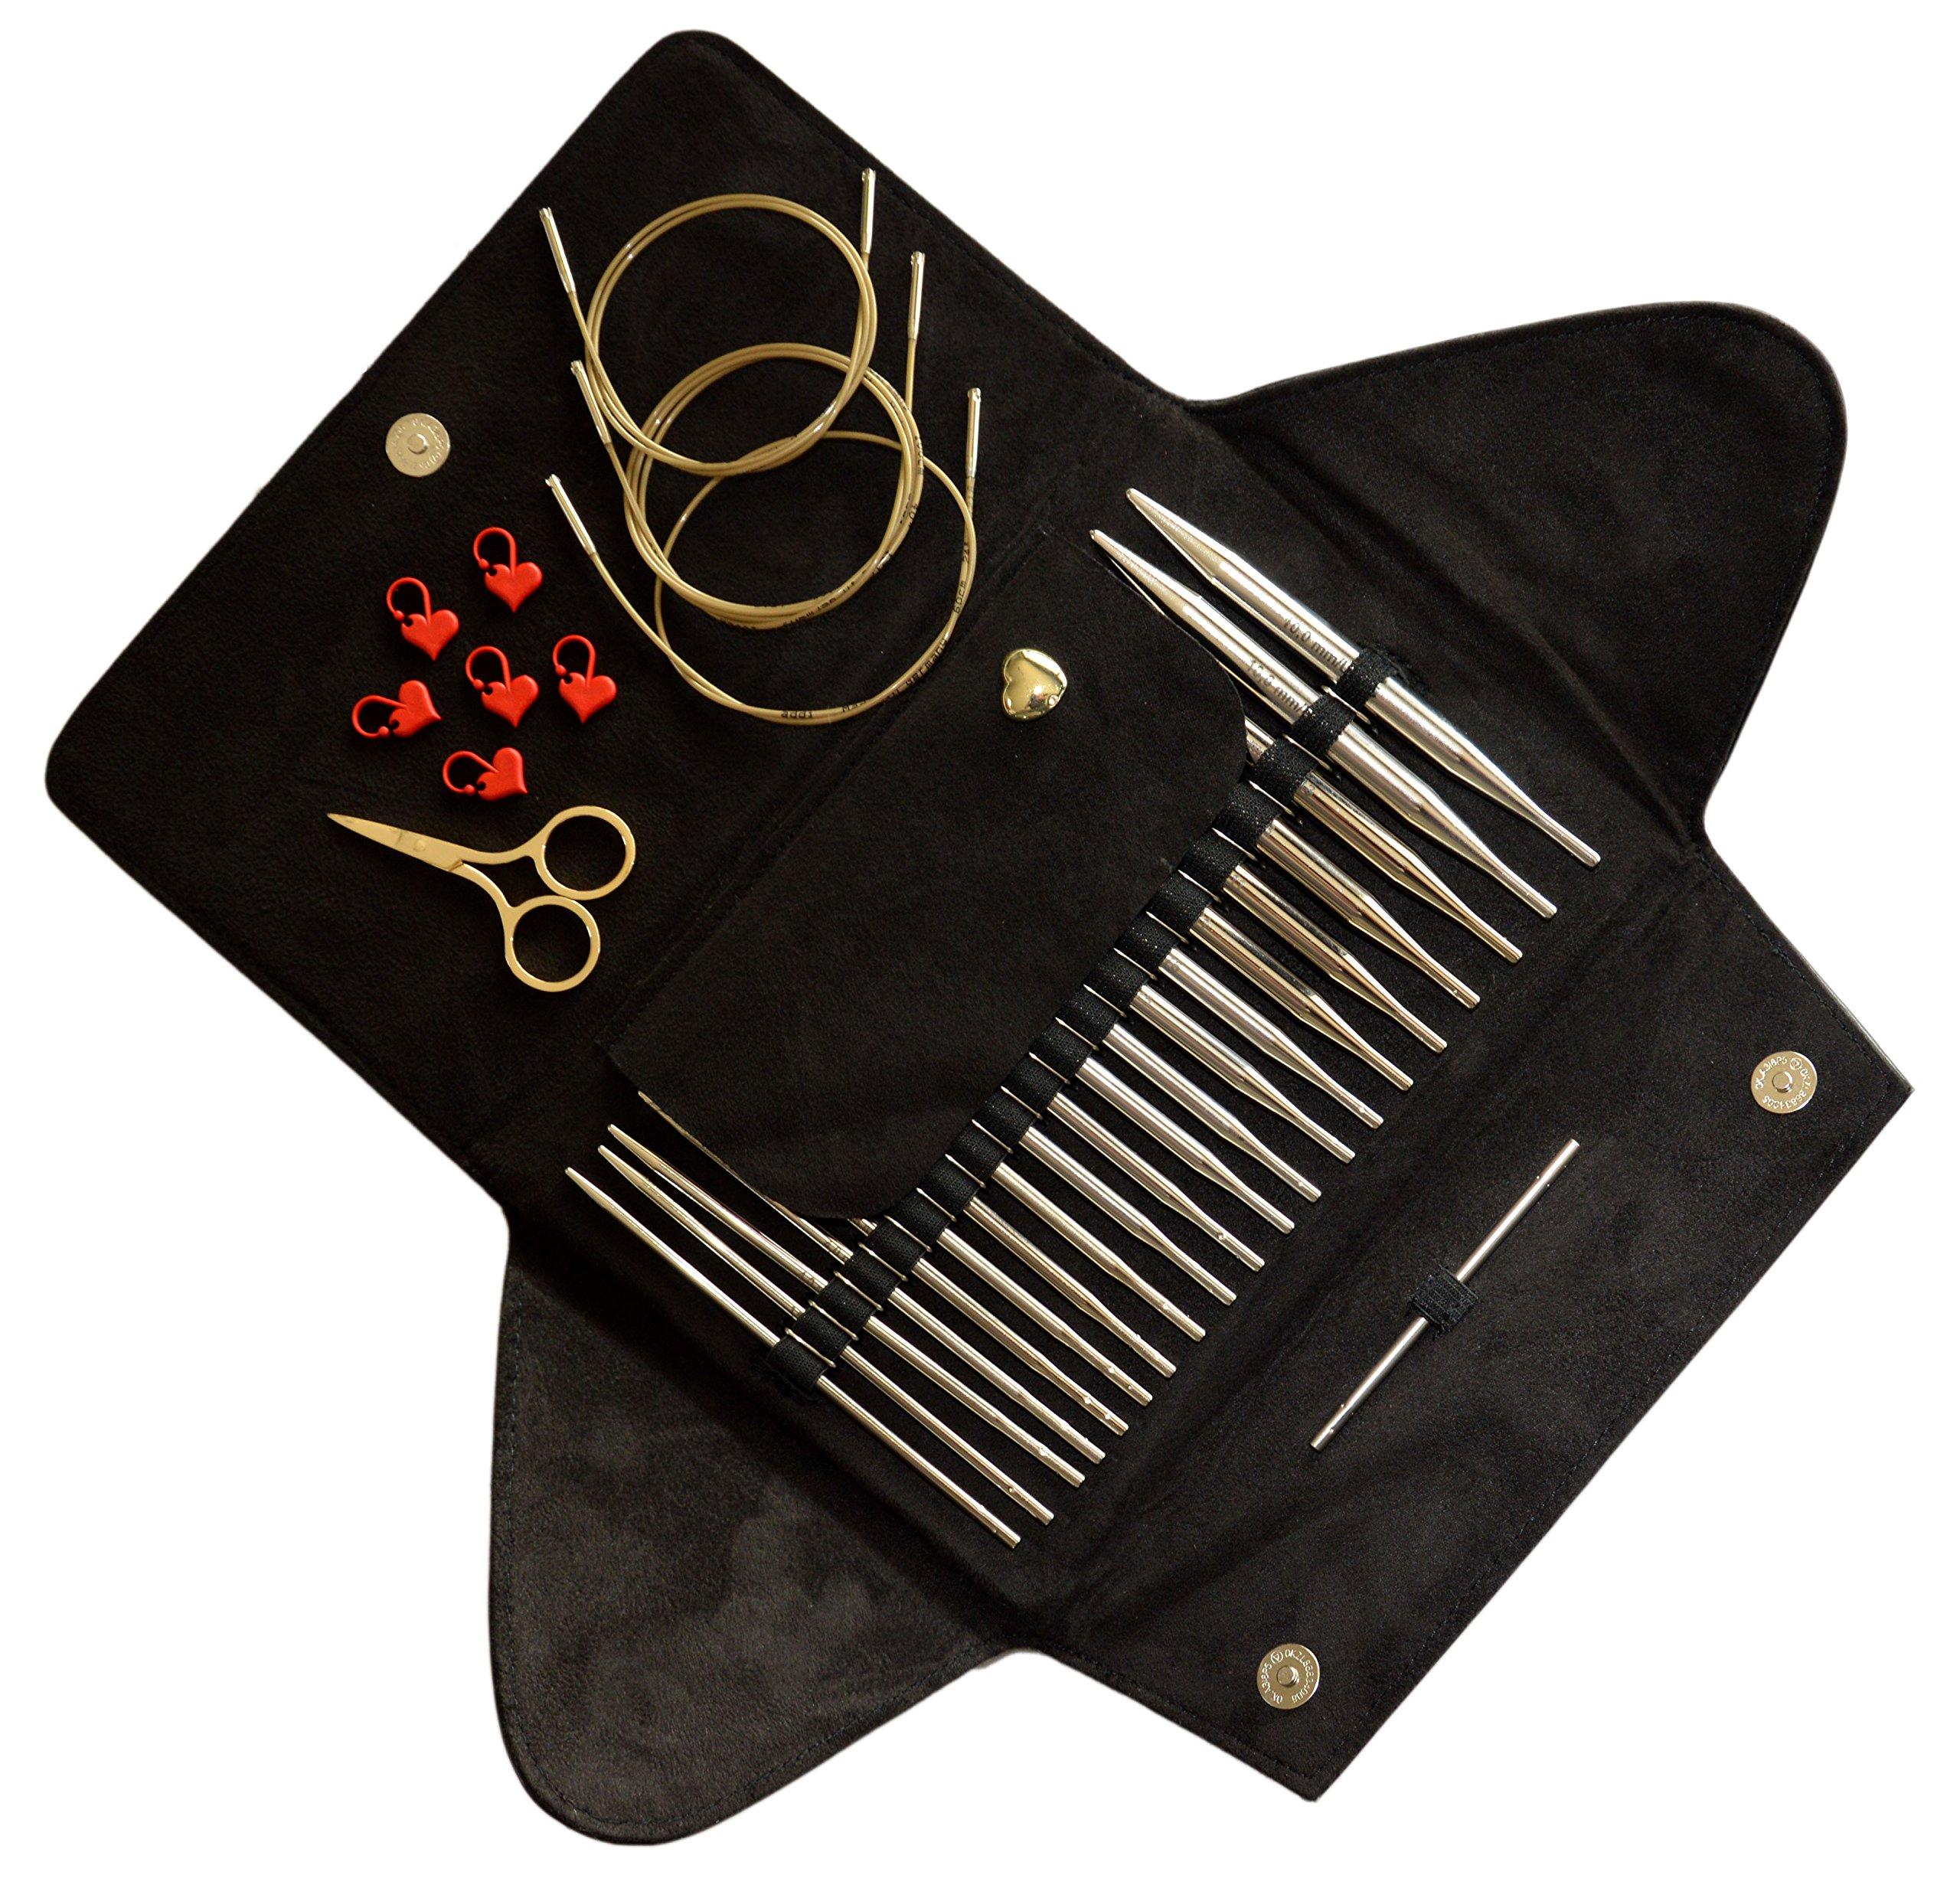 addi Click BASIC GOLD Edition - Interchangeable Needle Set - Included addi Gold Scissors, addi Gold Cords, addi Love Stitch Marker and addiGrip Pads